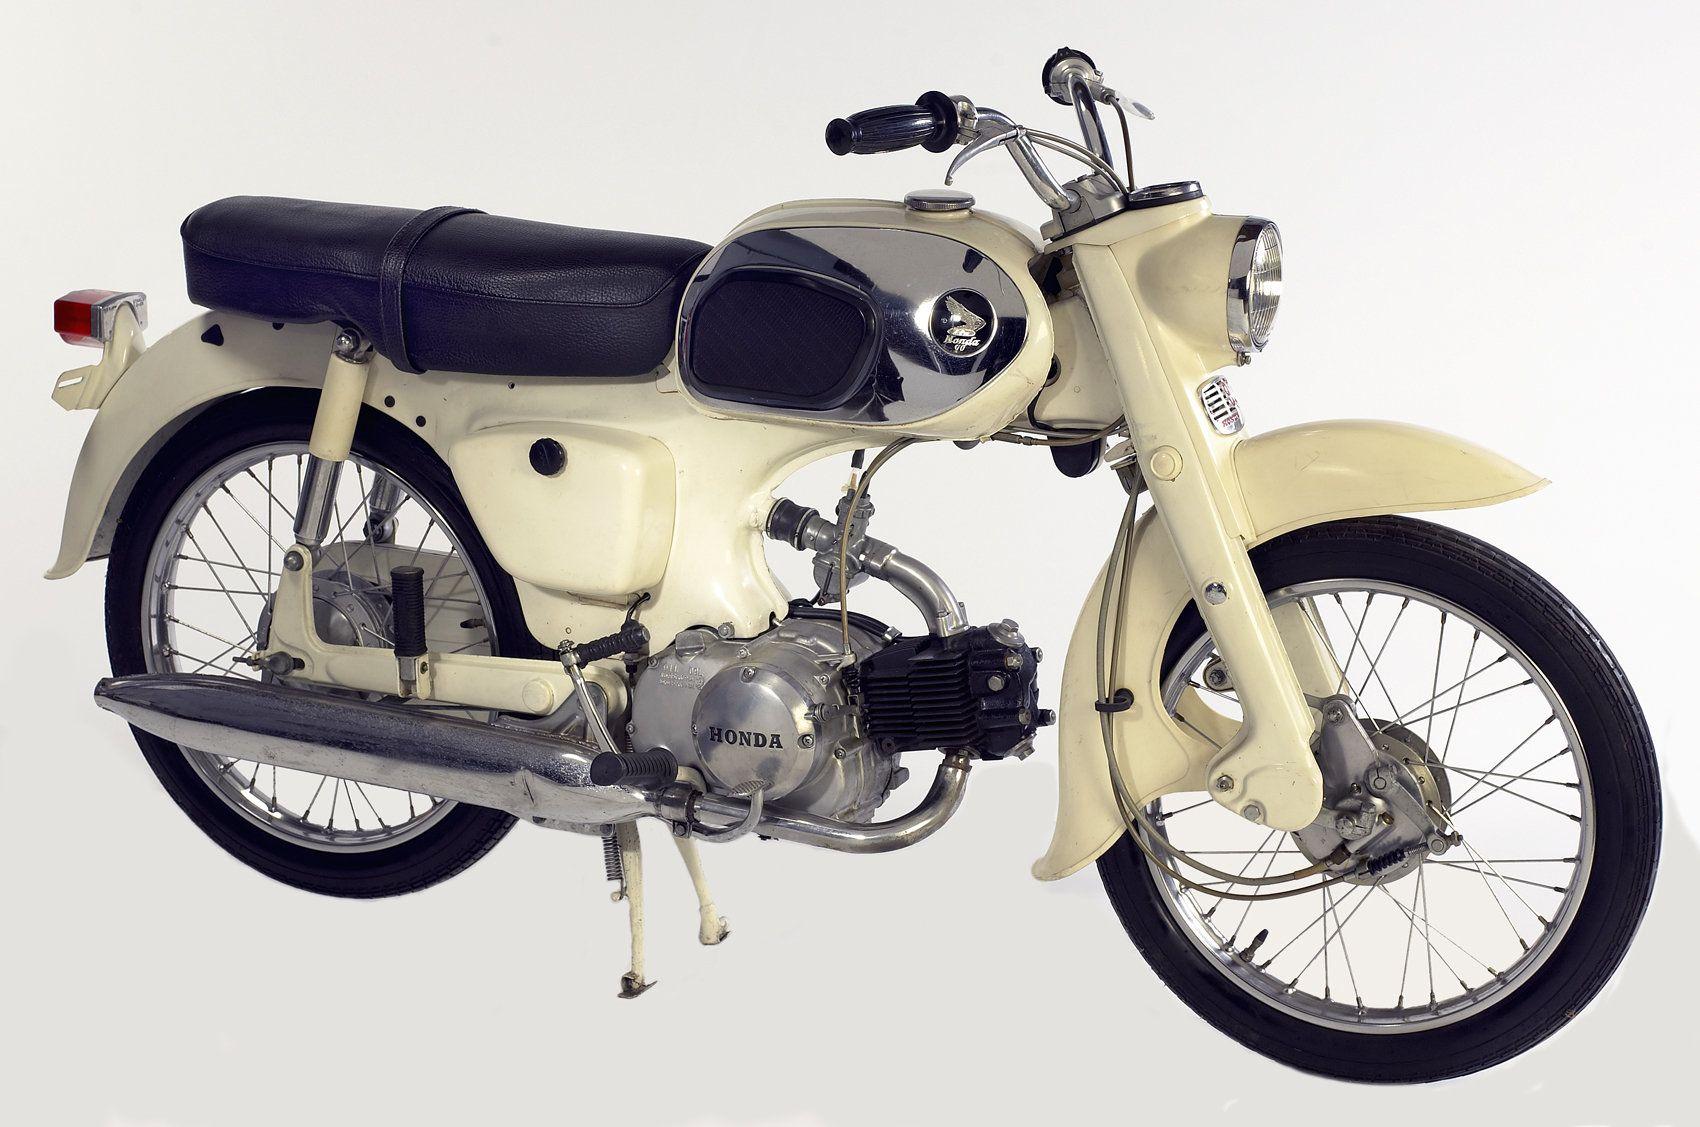 1965 C200 Honda Museum Com Vintage Honda Motorcycles Honda Motorcycle Parts Motorcycle